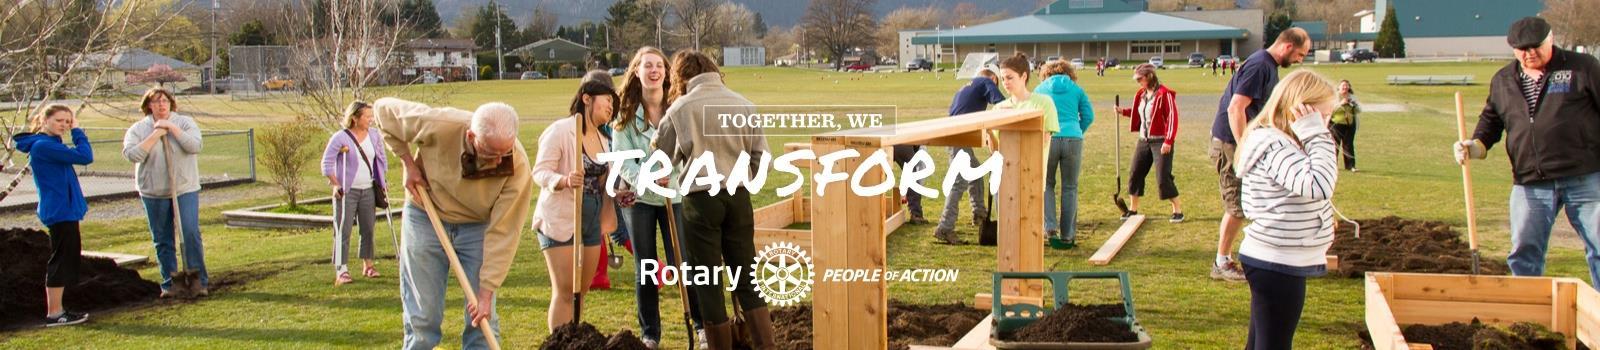 We Transform